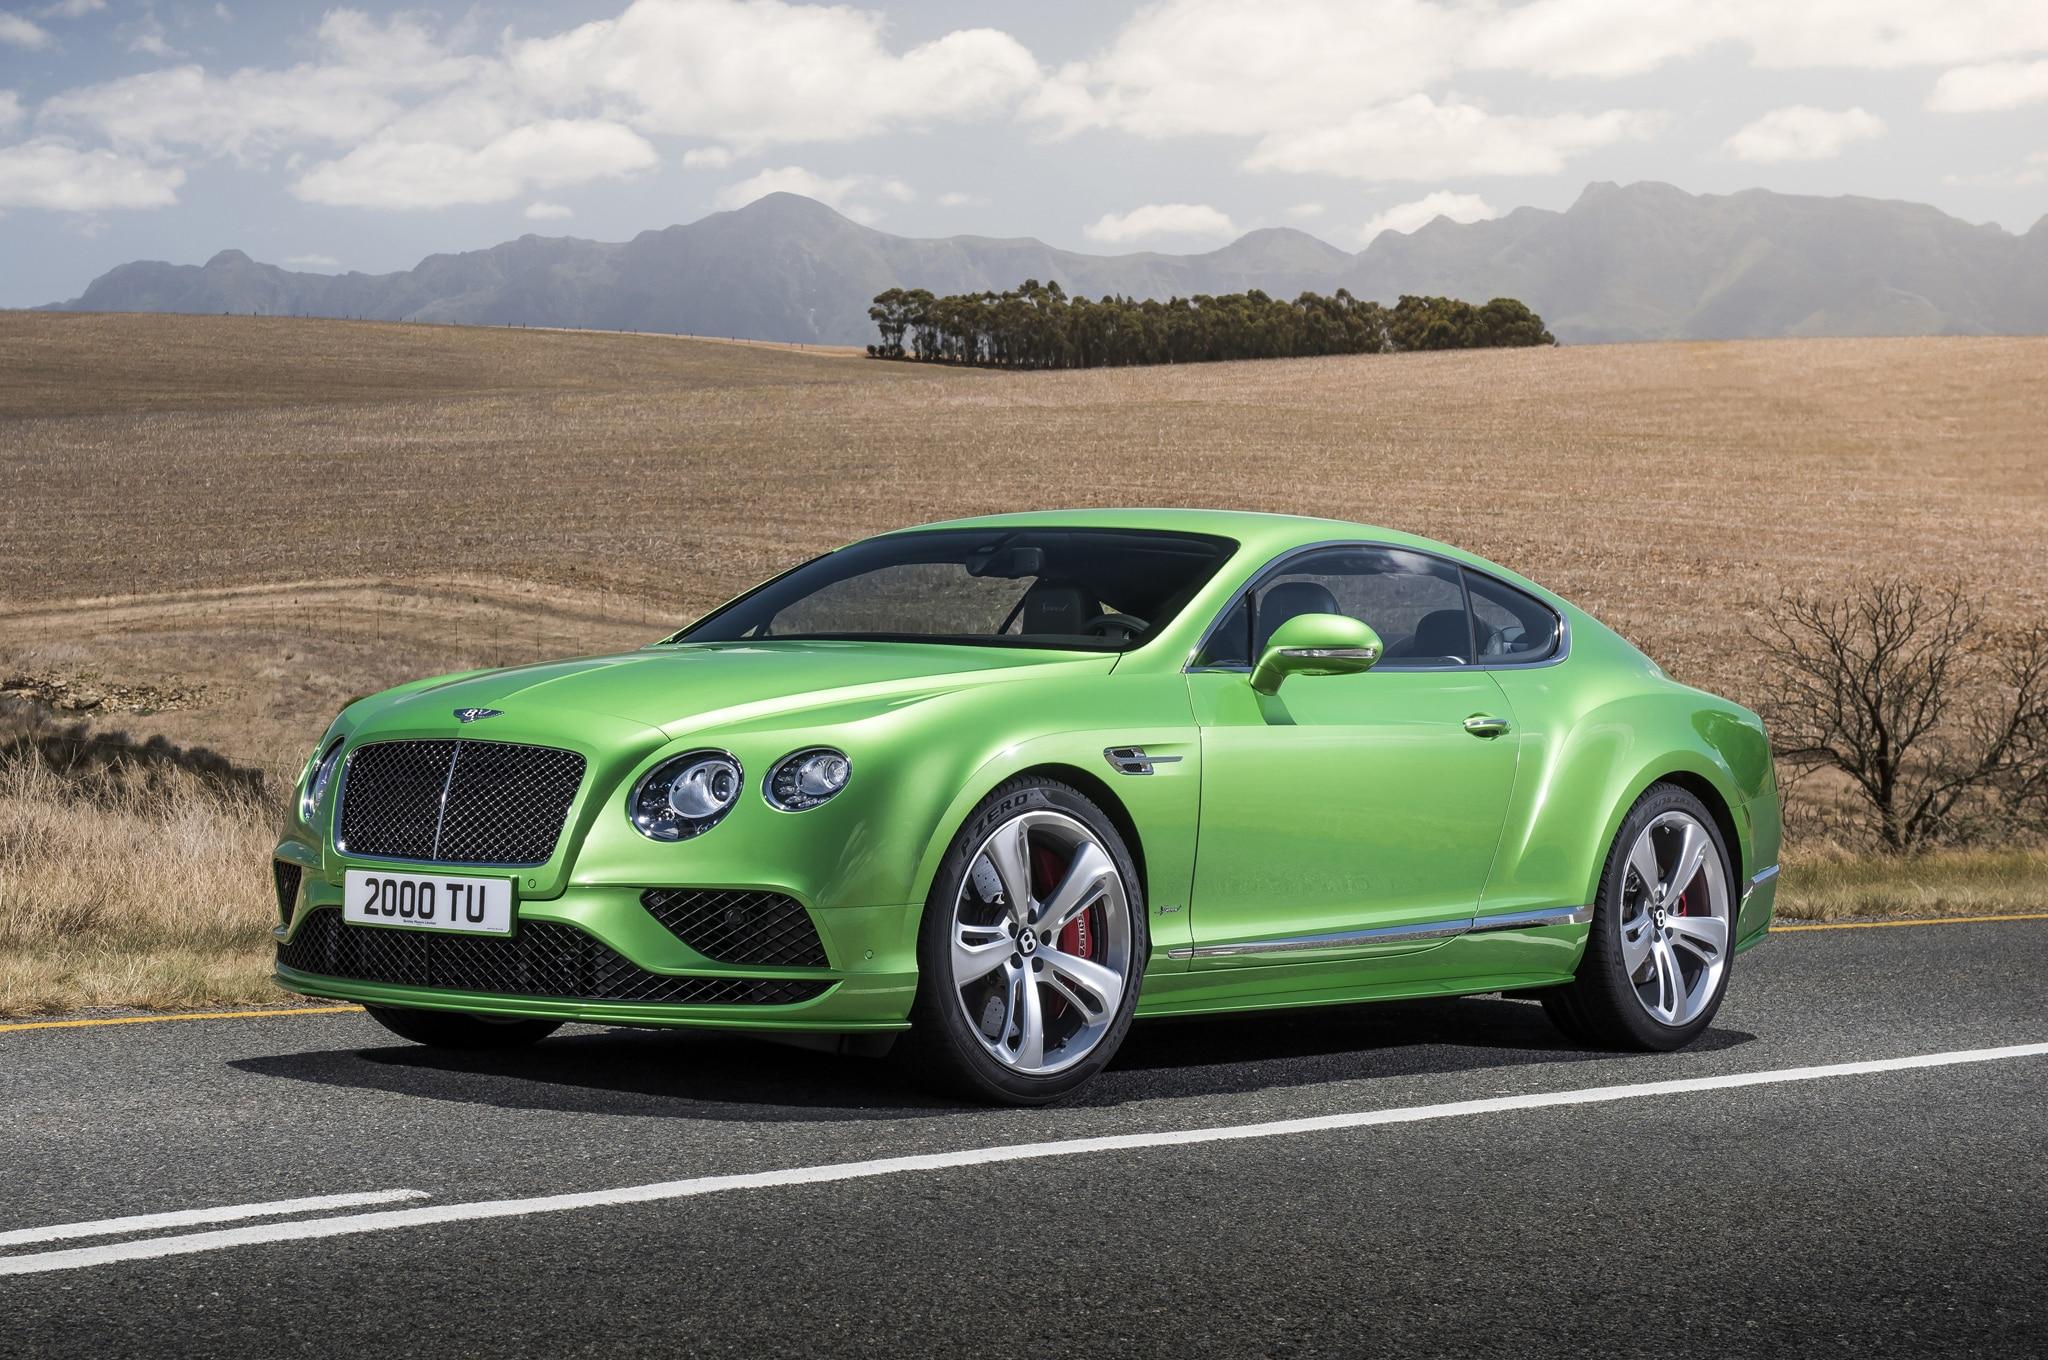 2016 Bentley Continental GT Review